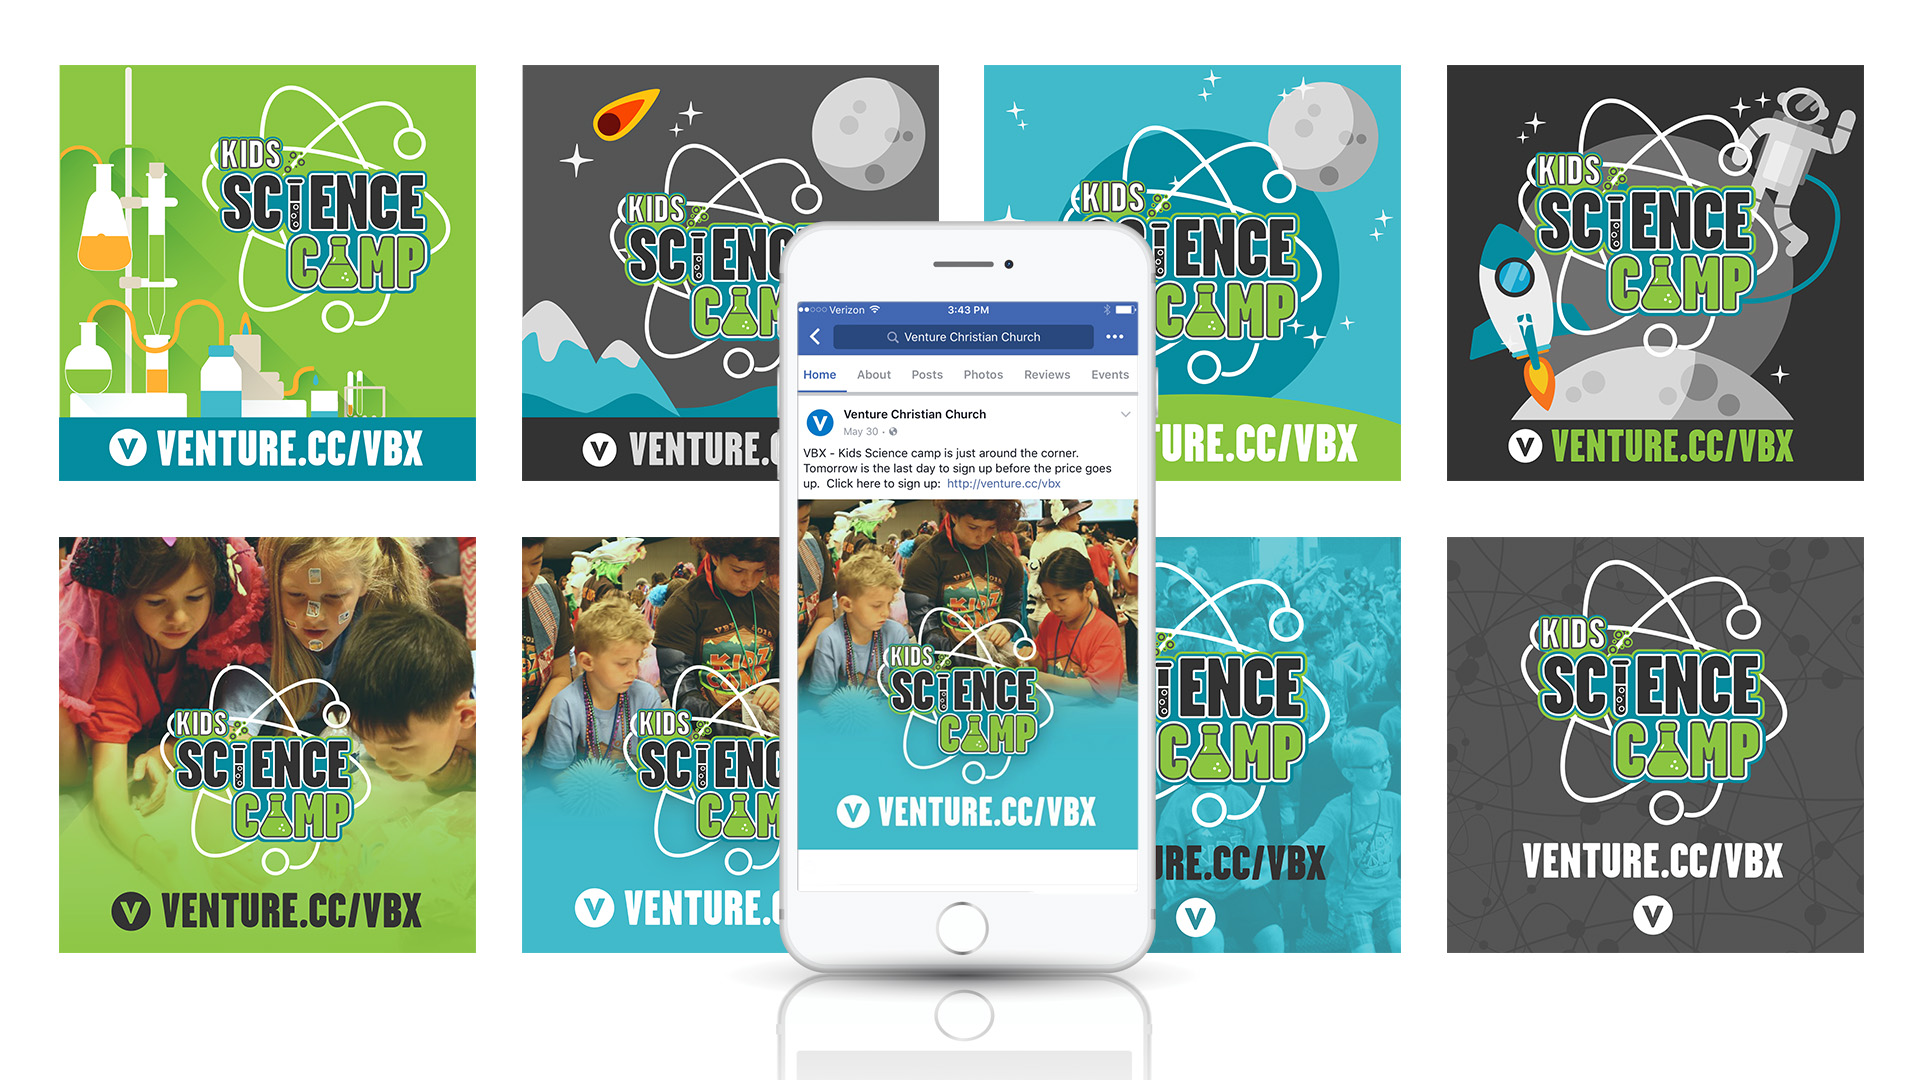 Kids Science Camp 2017 - Vacation Bible School VBS VBX Social Media Graphic Design